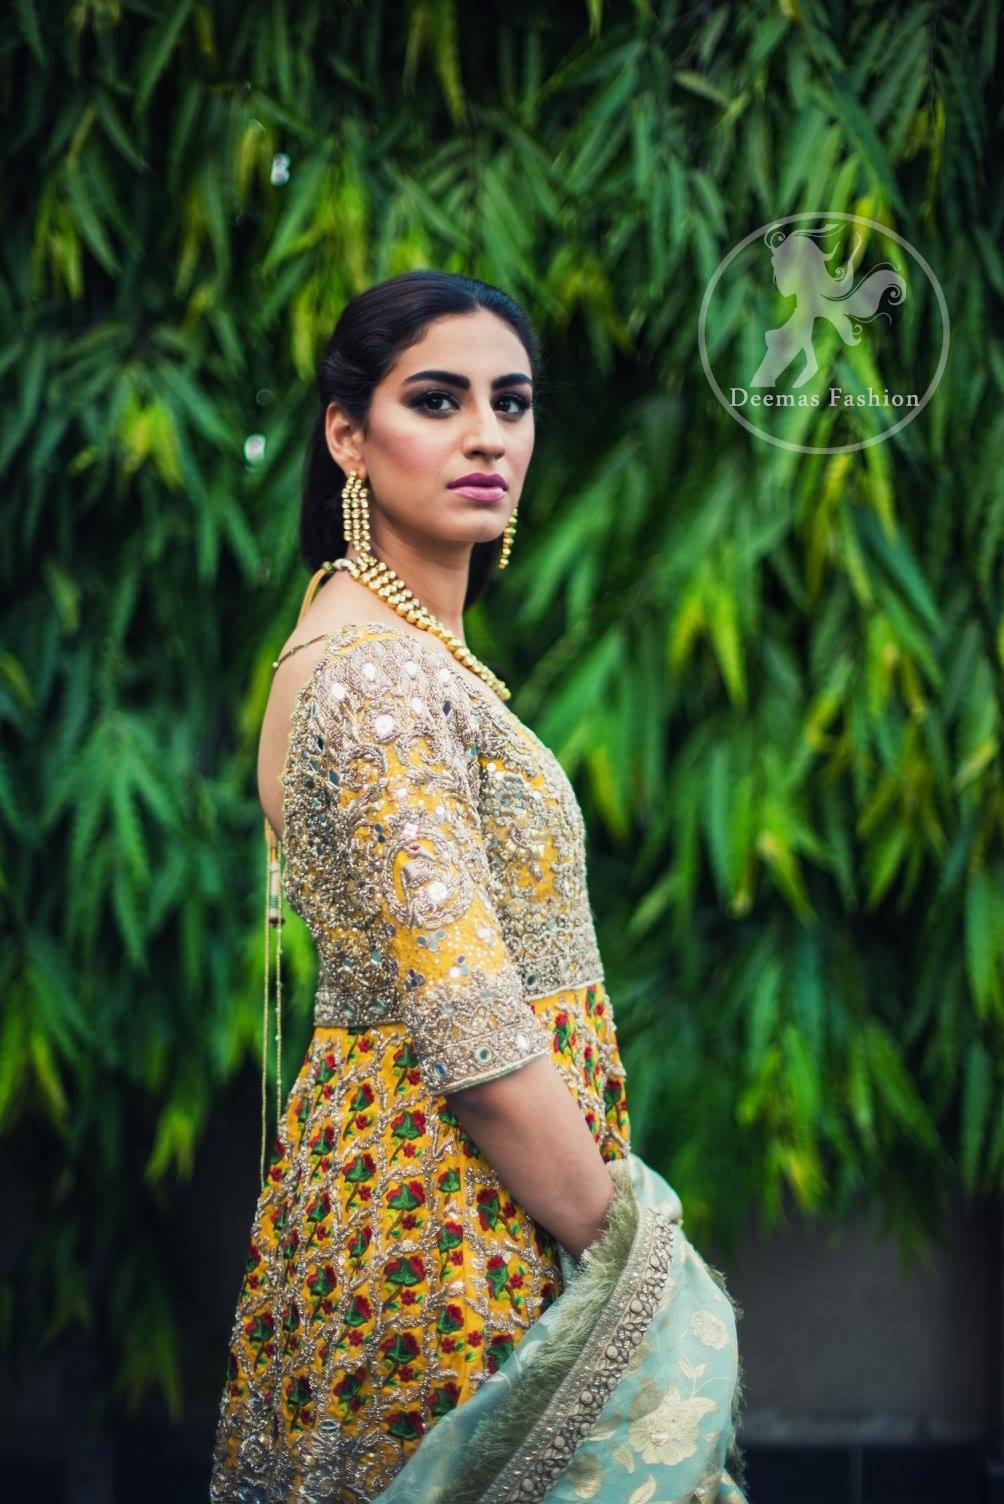 mehndi-dress-2016-yellow-short-frock-with-light-green-gharara-5